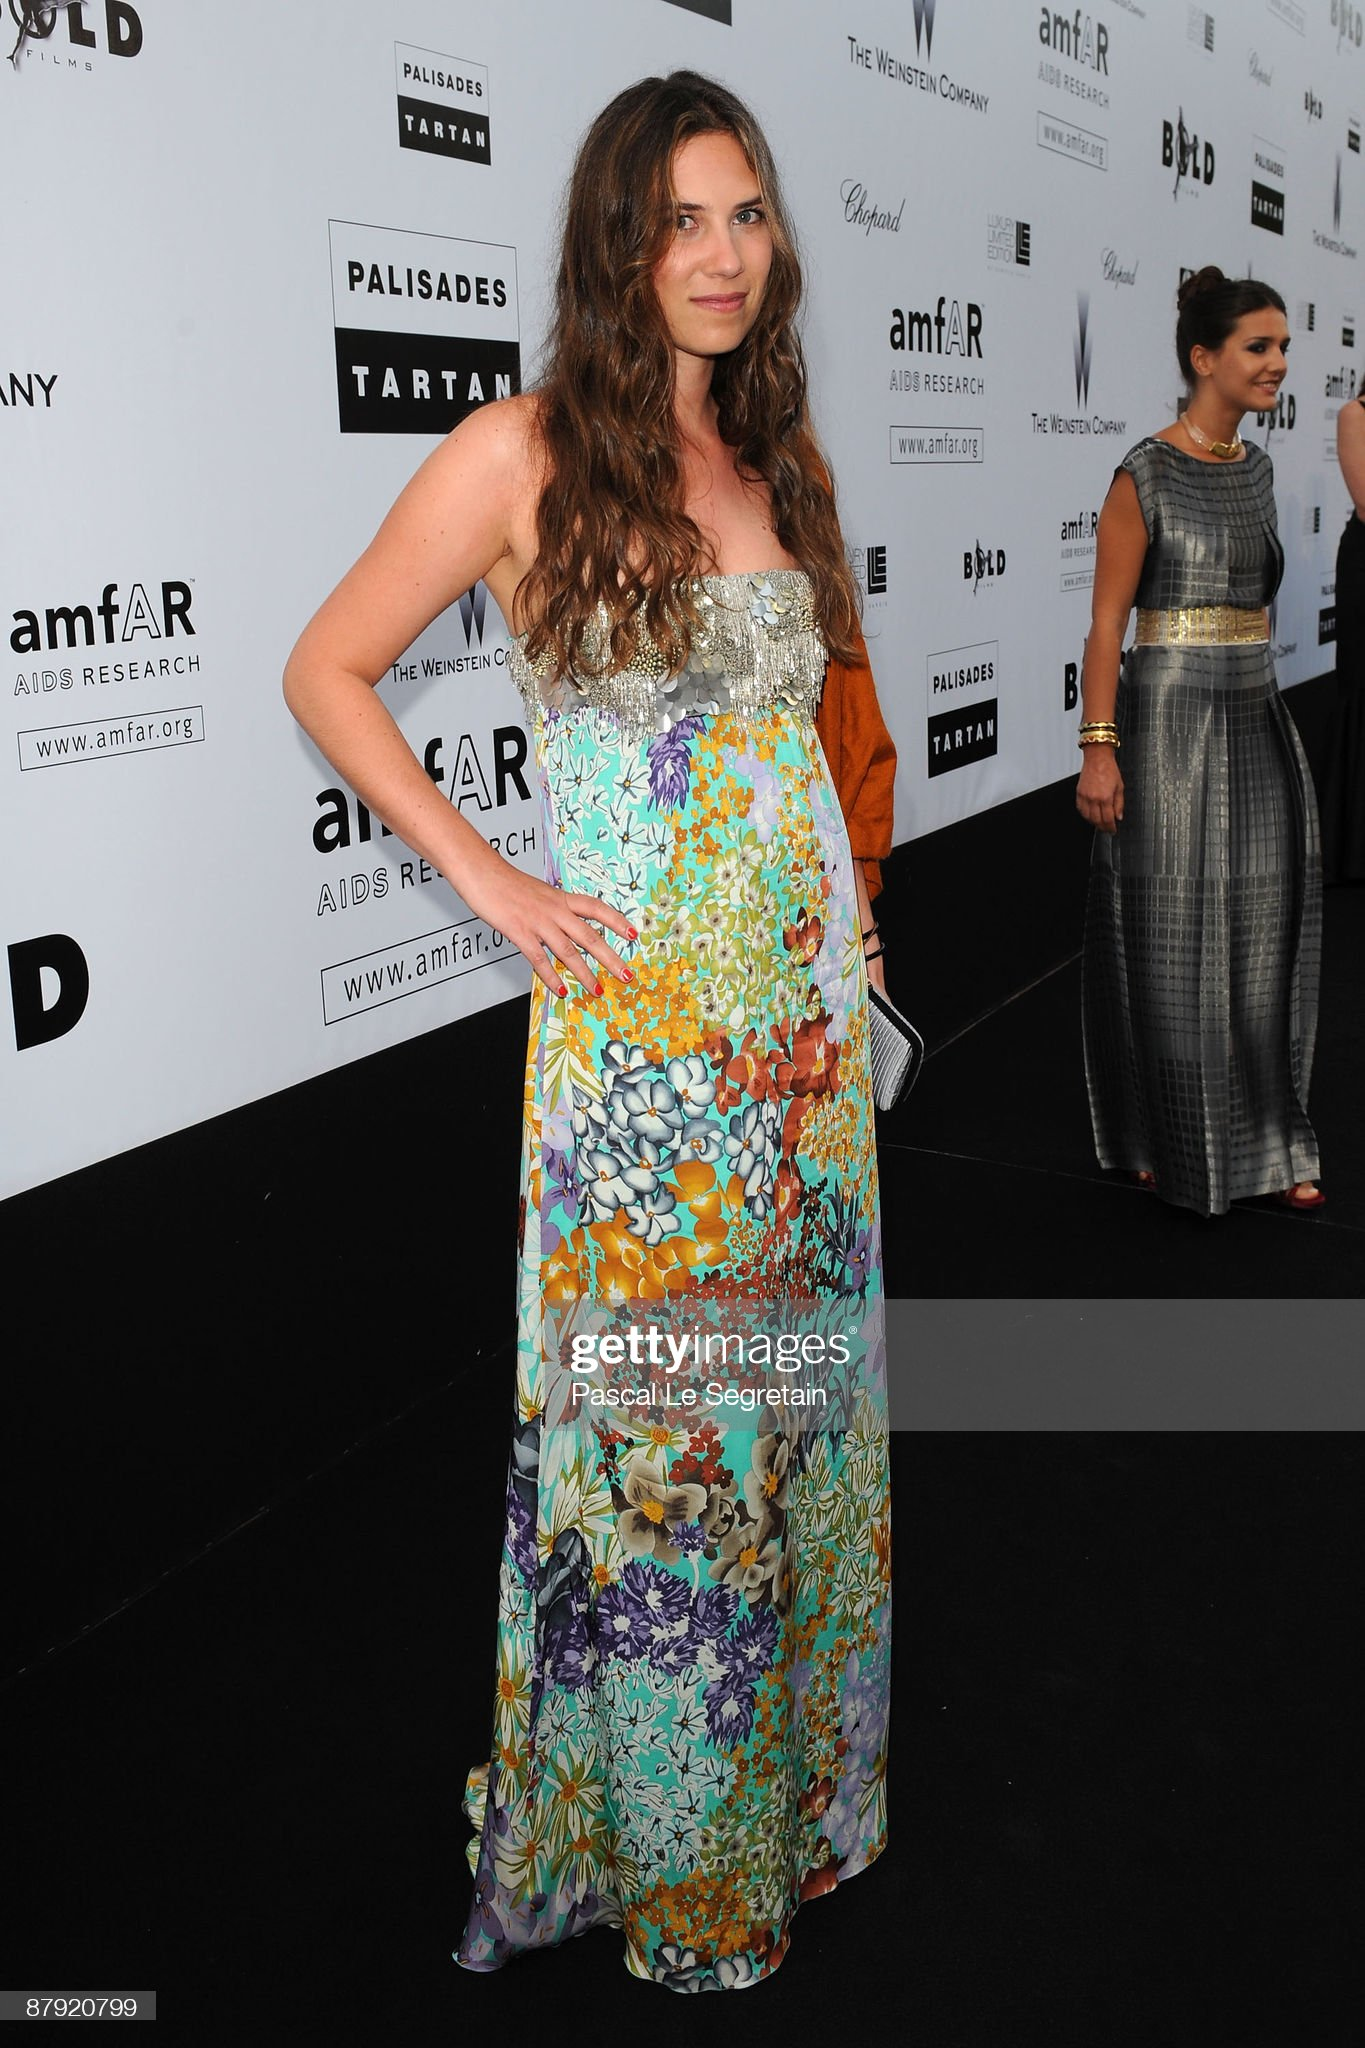 amfAR Cinema Against AIDS - Arrivals - 2009 Cannes Film Festival : News Photo